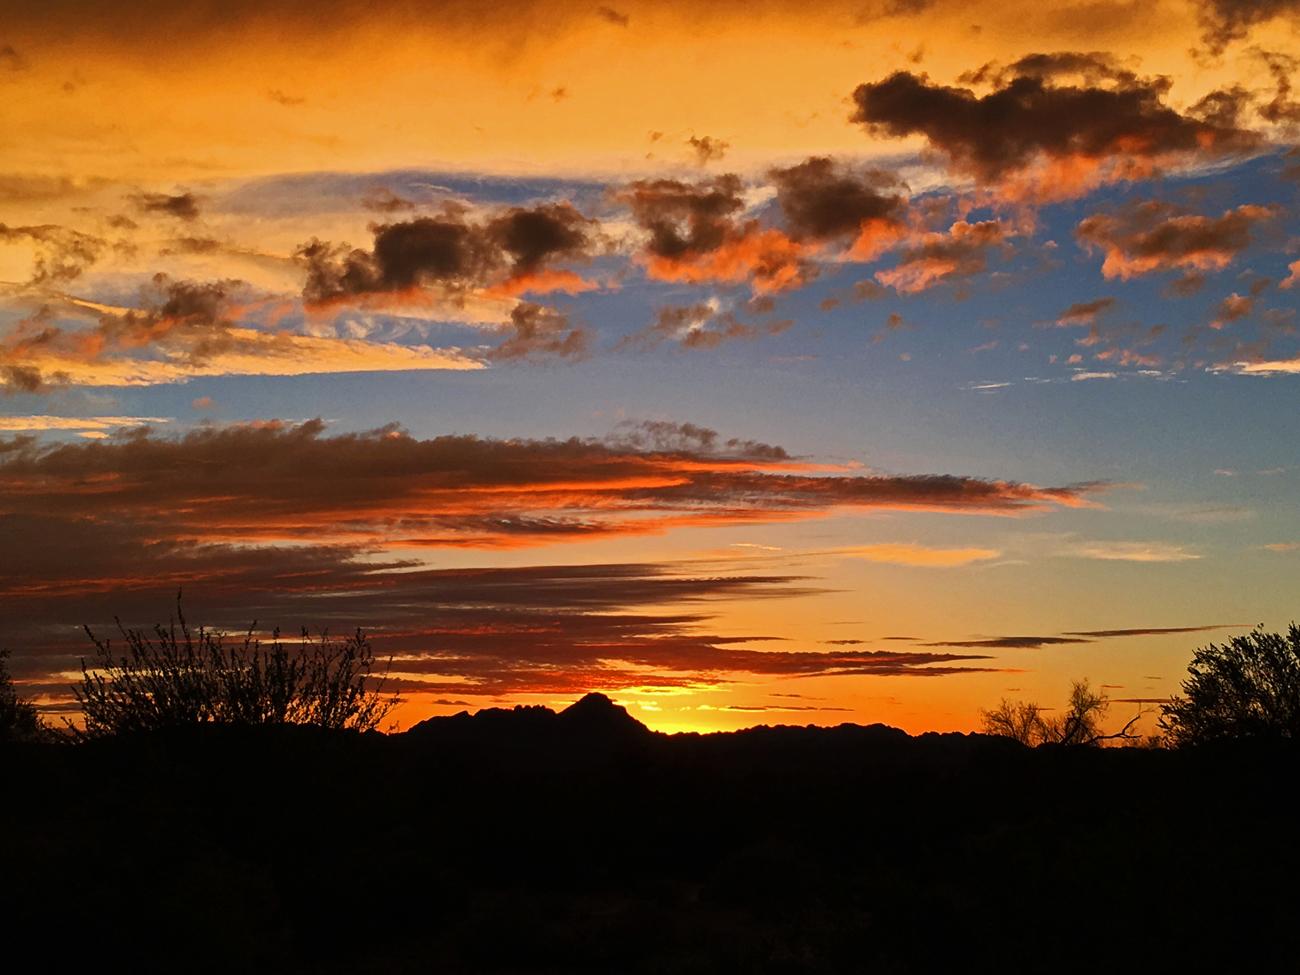 Dramatic, intense red and orange sunset behind the Trigo Mountains